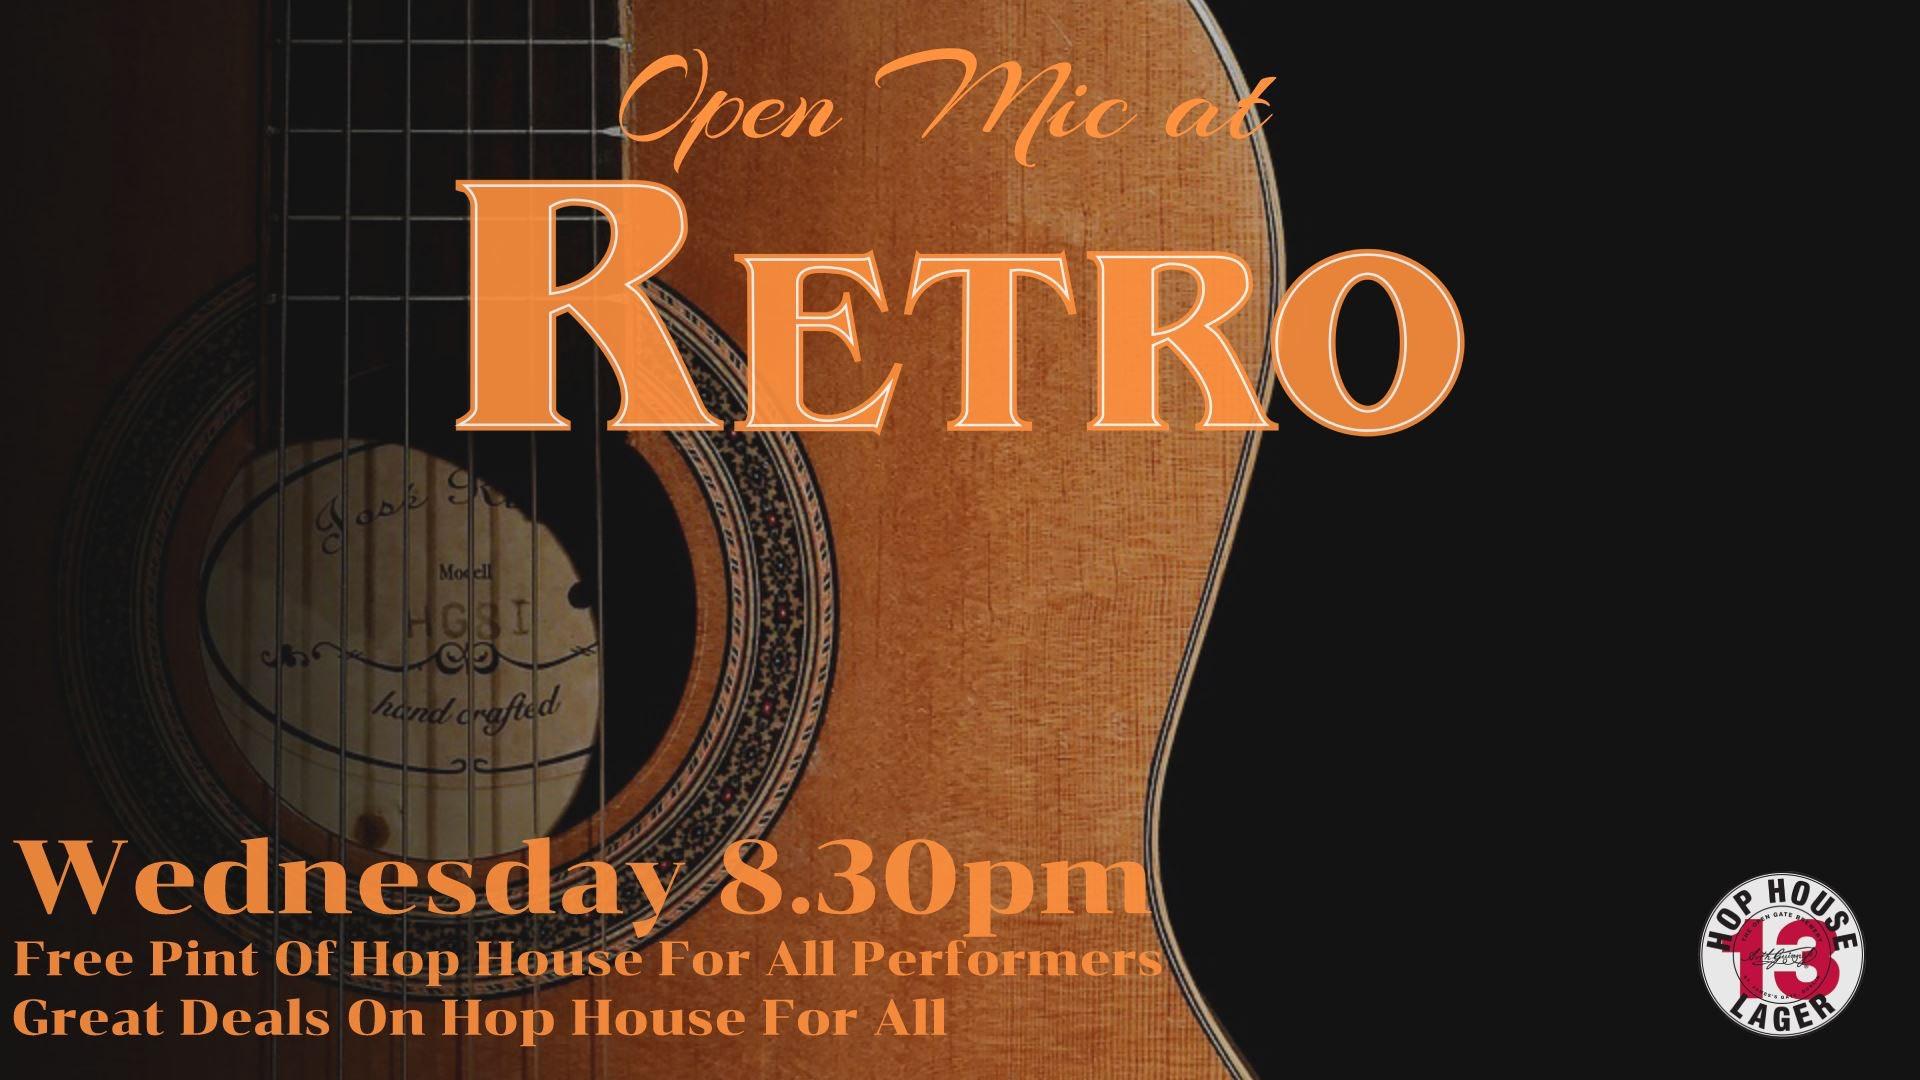 Open Mic At Retro